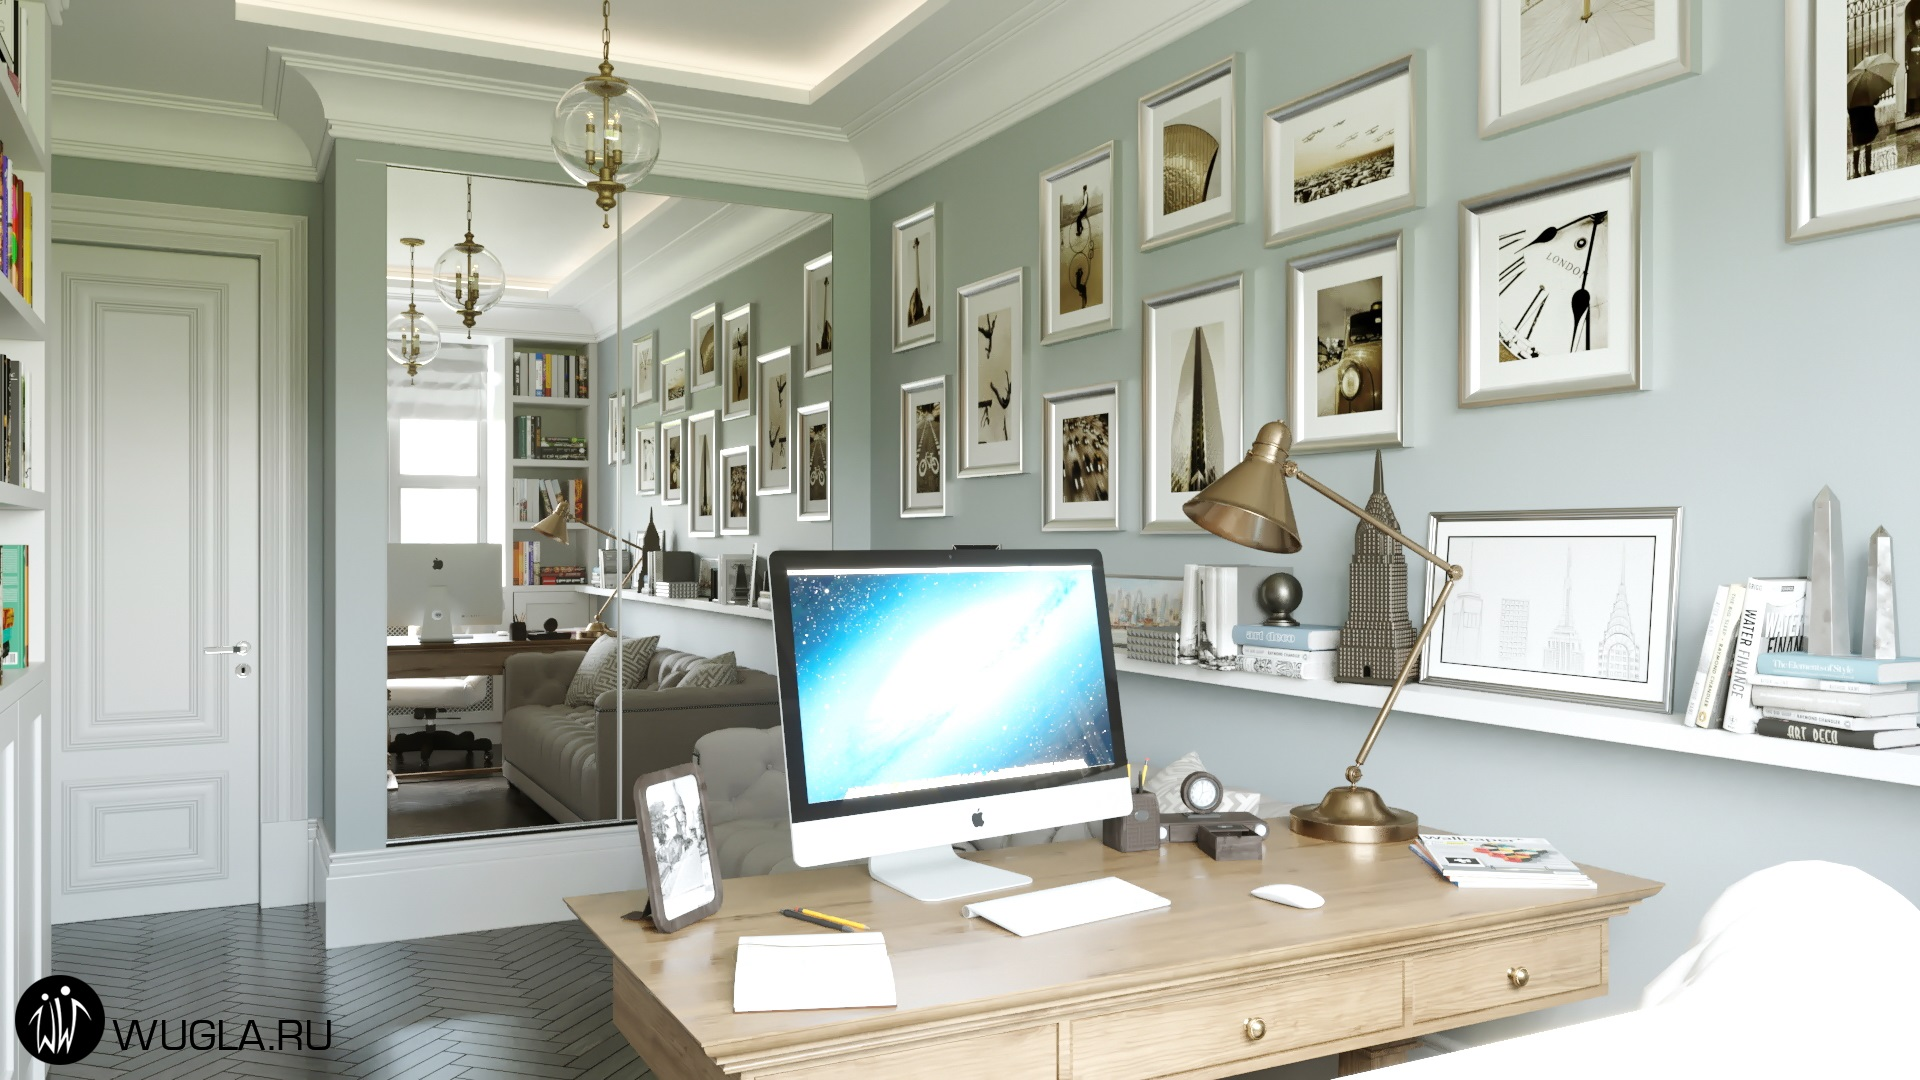 Москва. Дизайн кабинета.